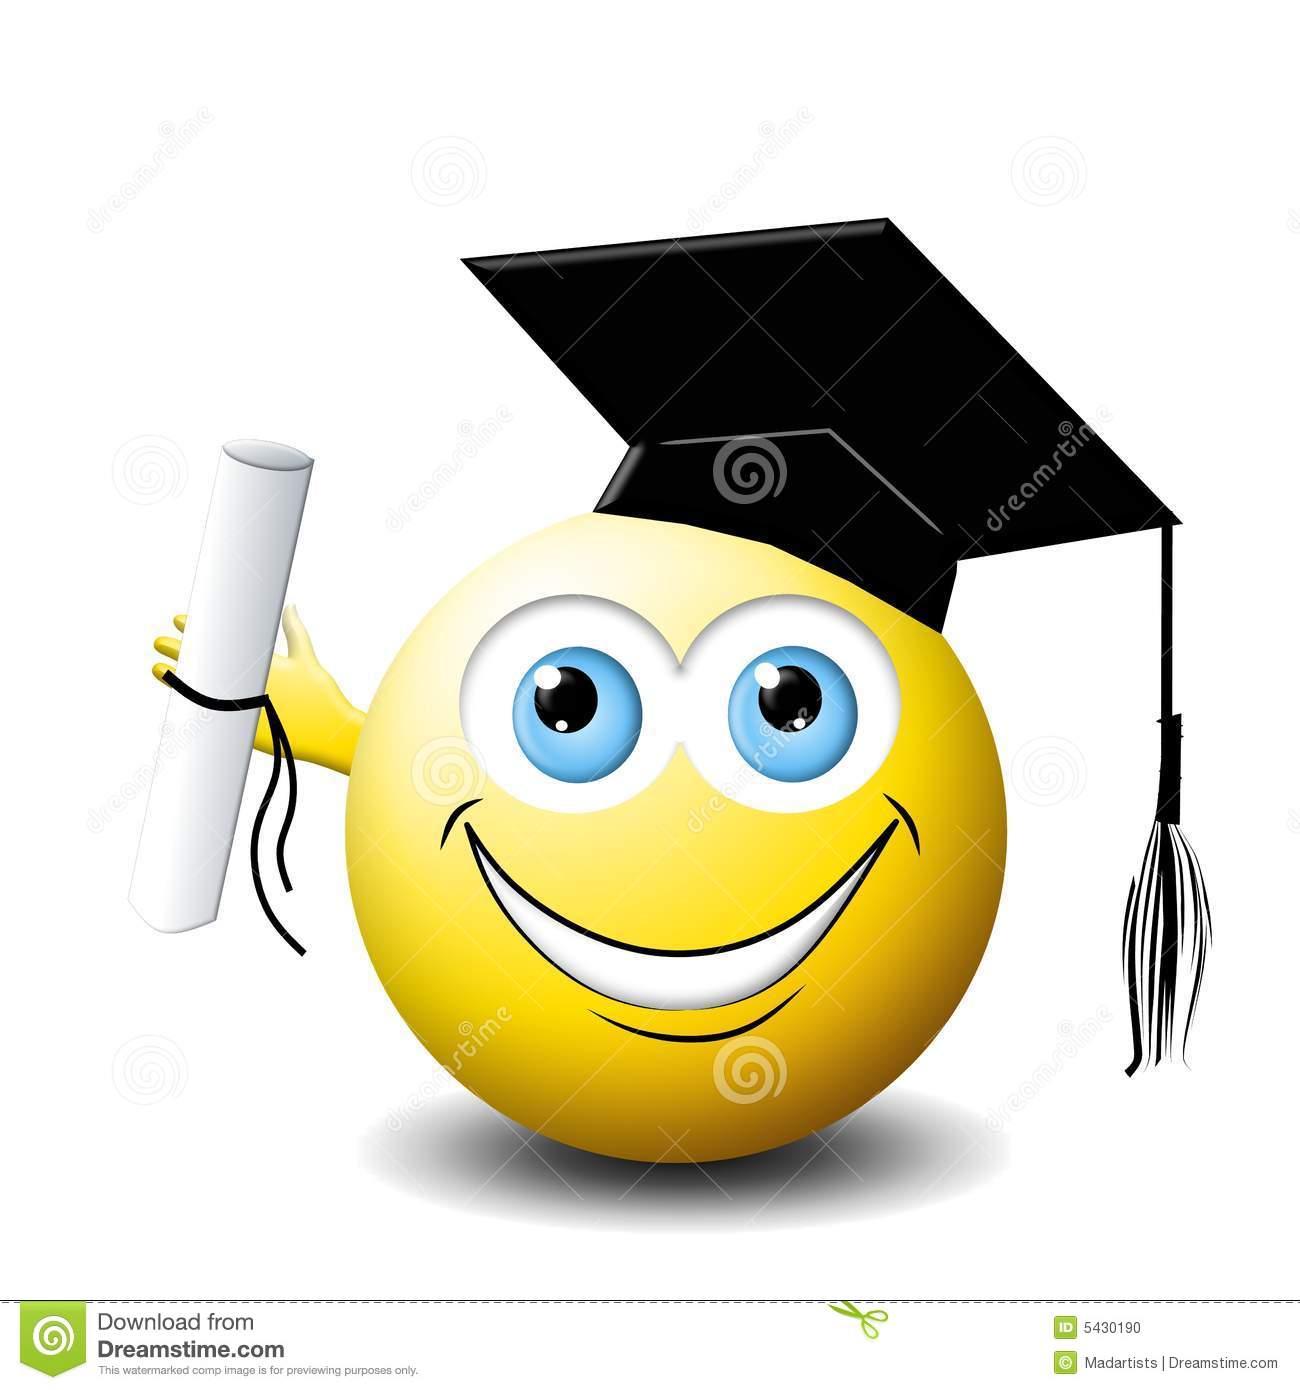 Smiley face Graduate stock illustration. Illustration of degree.